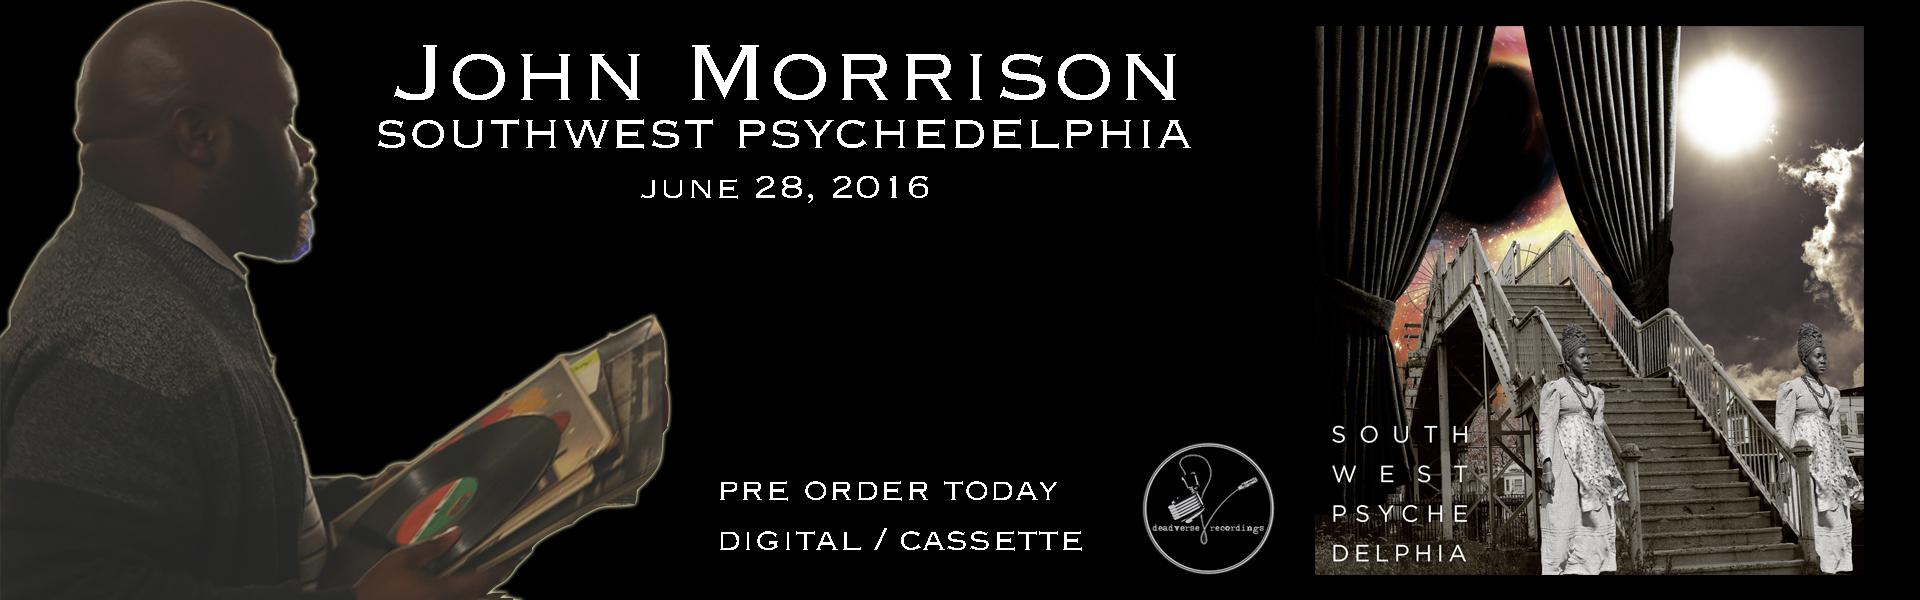 John Morrison Southwest Psychedelphia